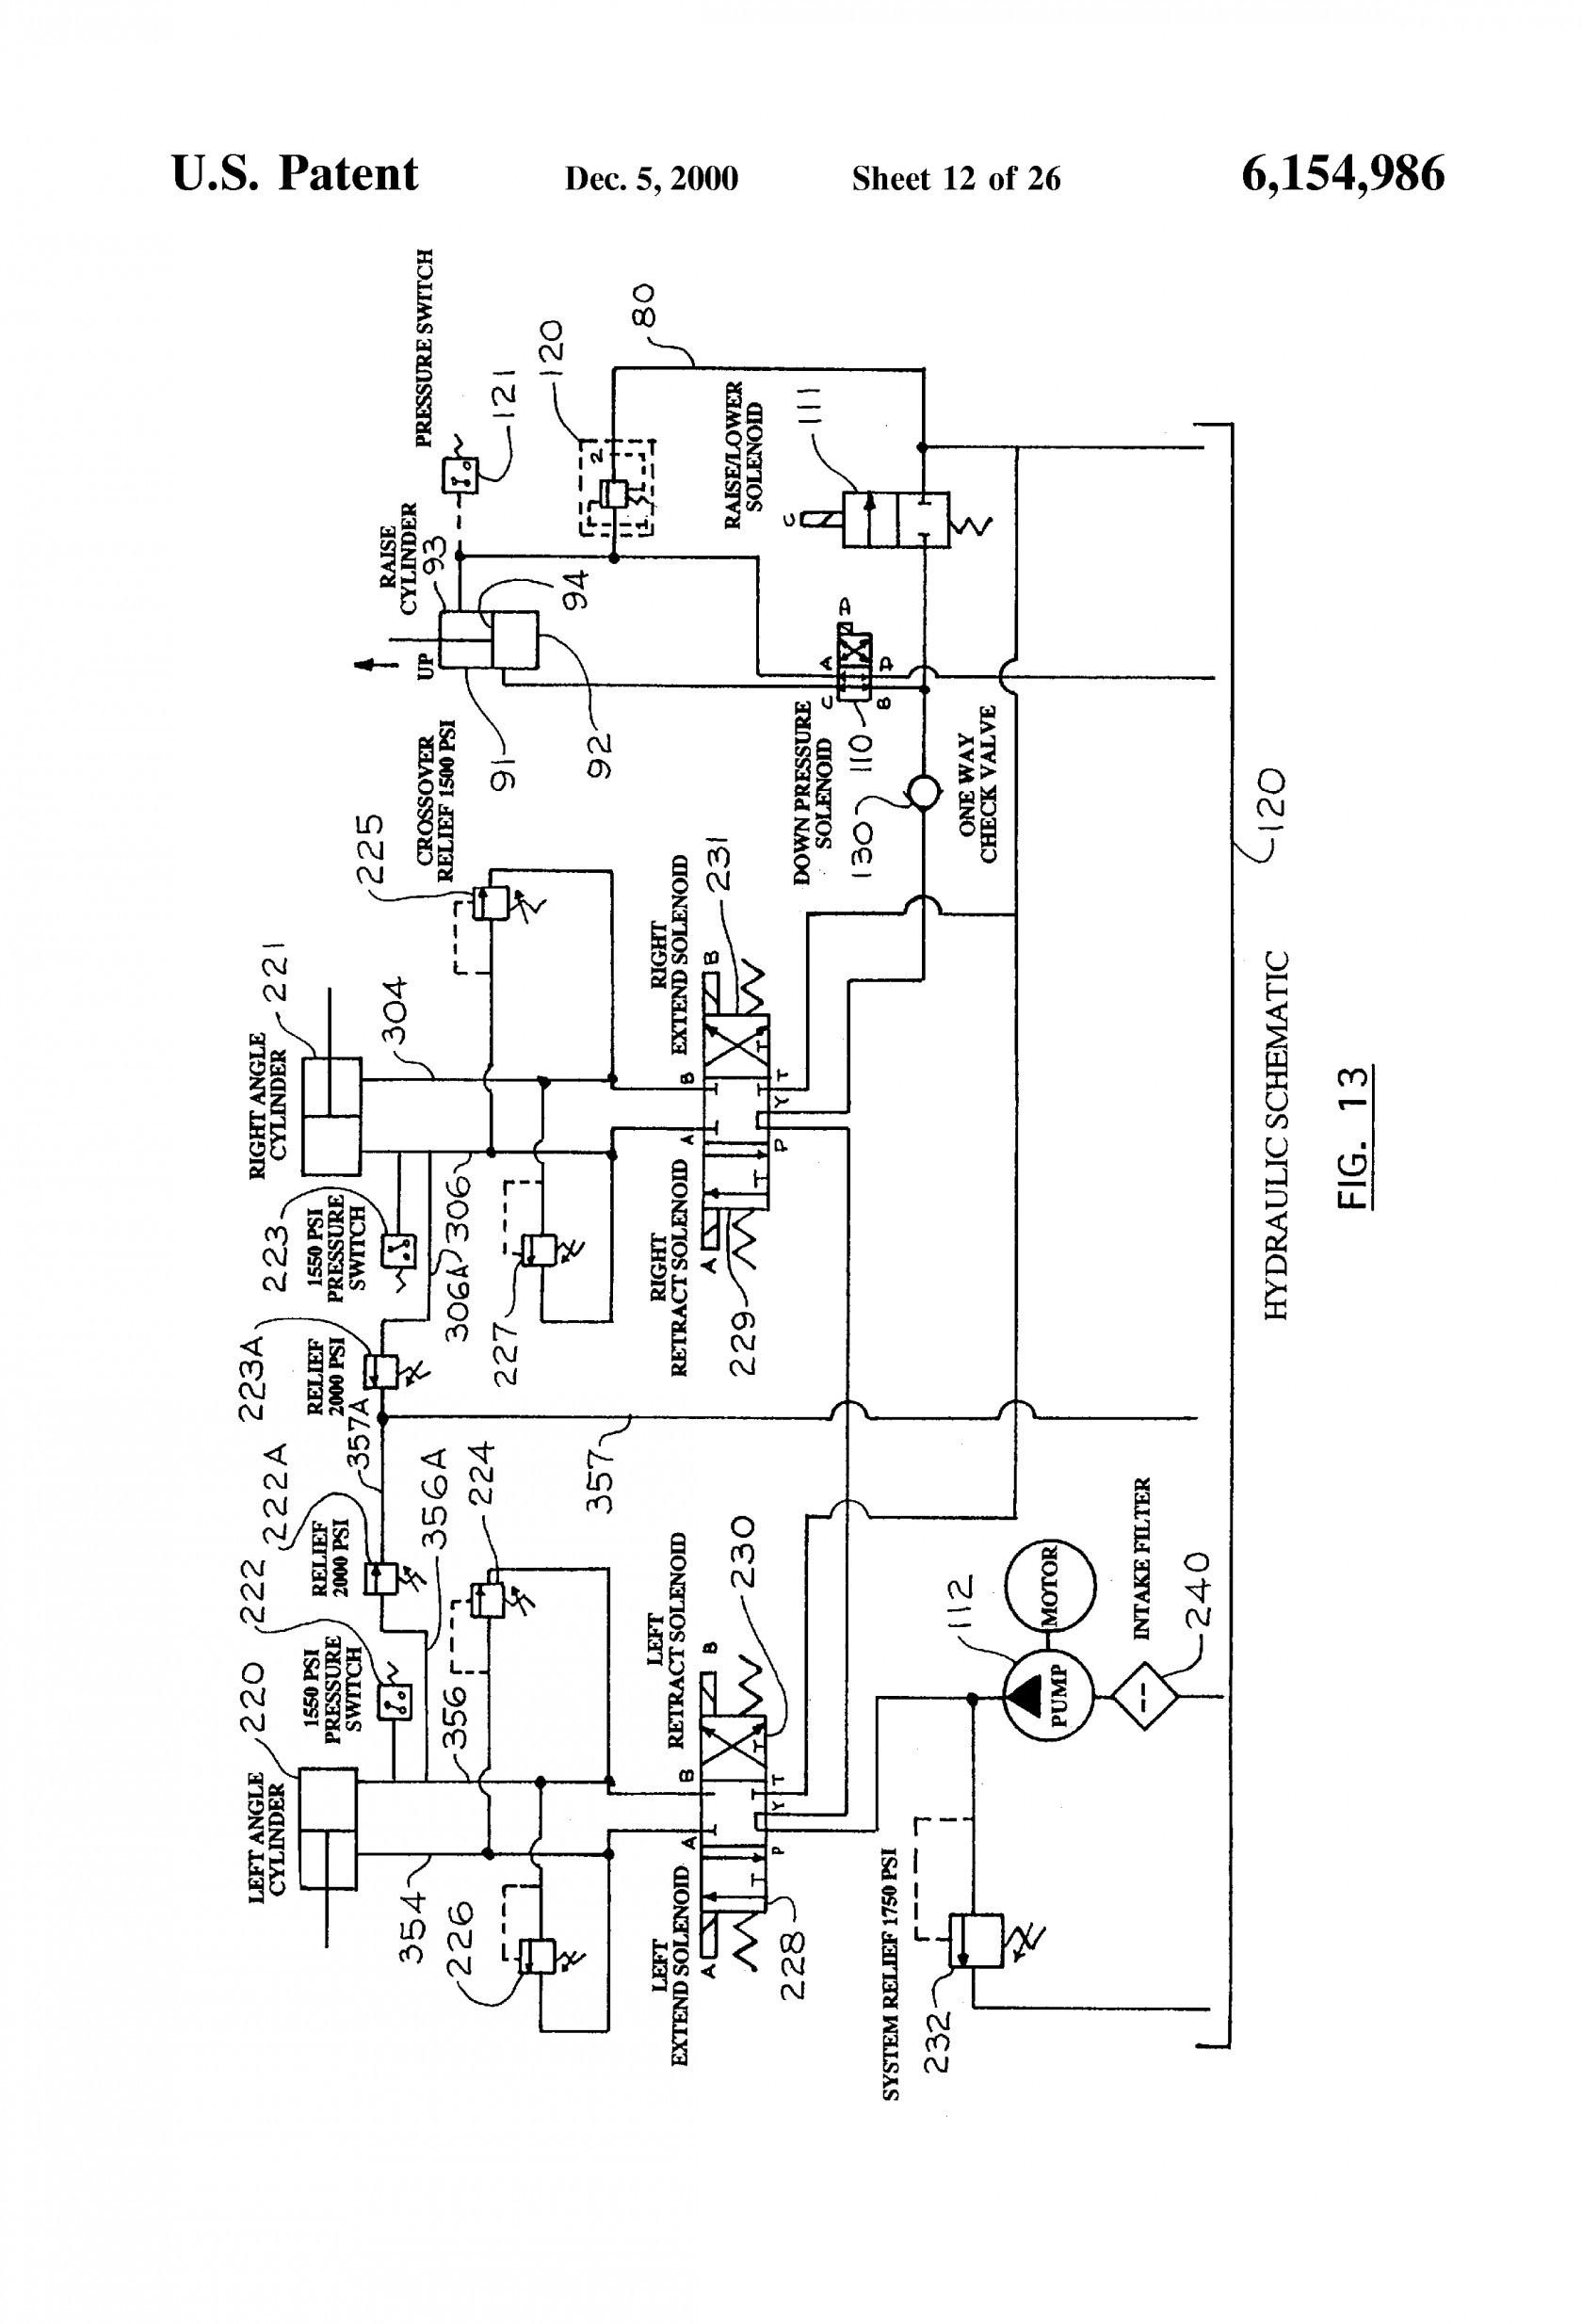 Fisher Plow Wiring Diagram Minute Mount 2 Unique Wiring Diagram - Boss V Plow Wiring Diagram